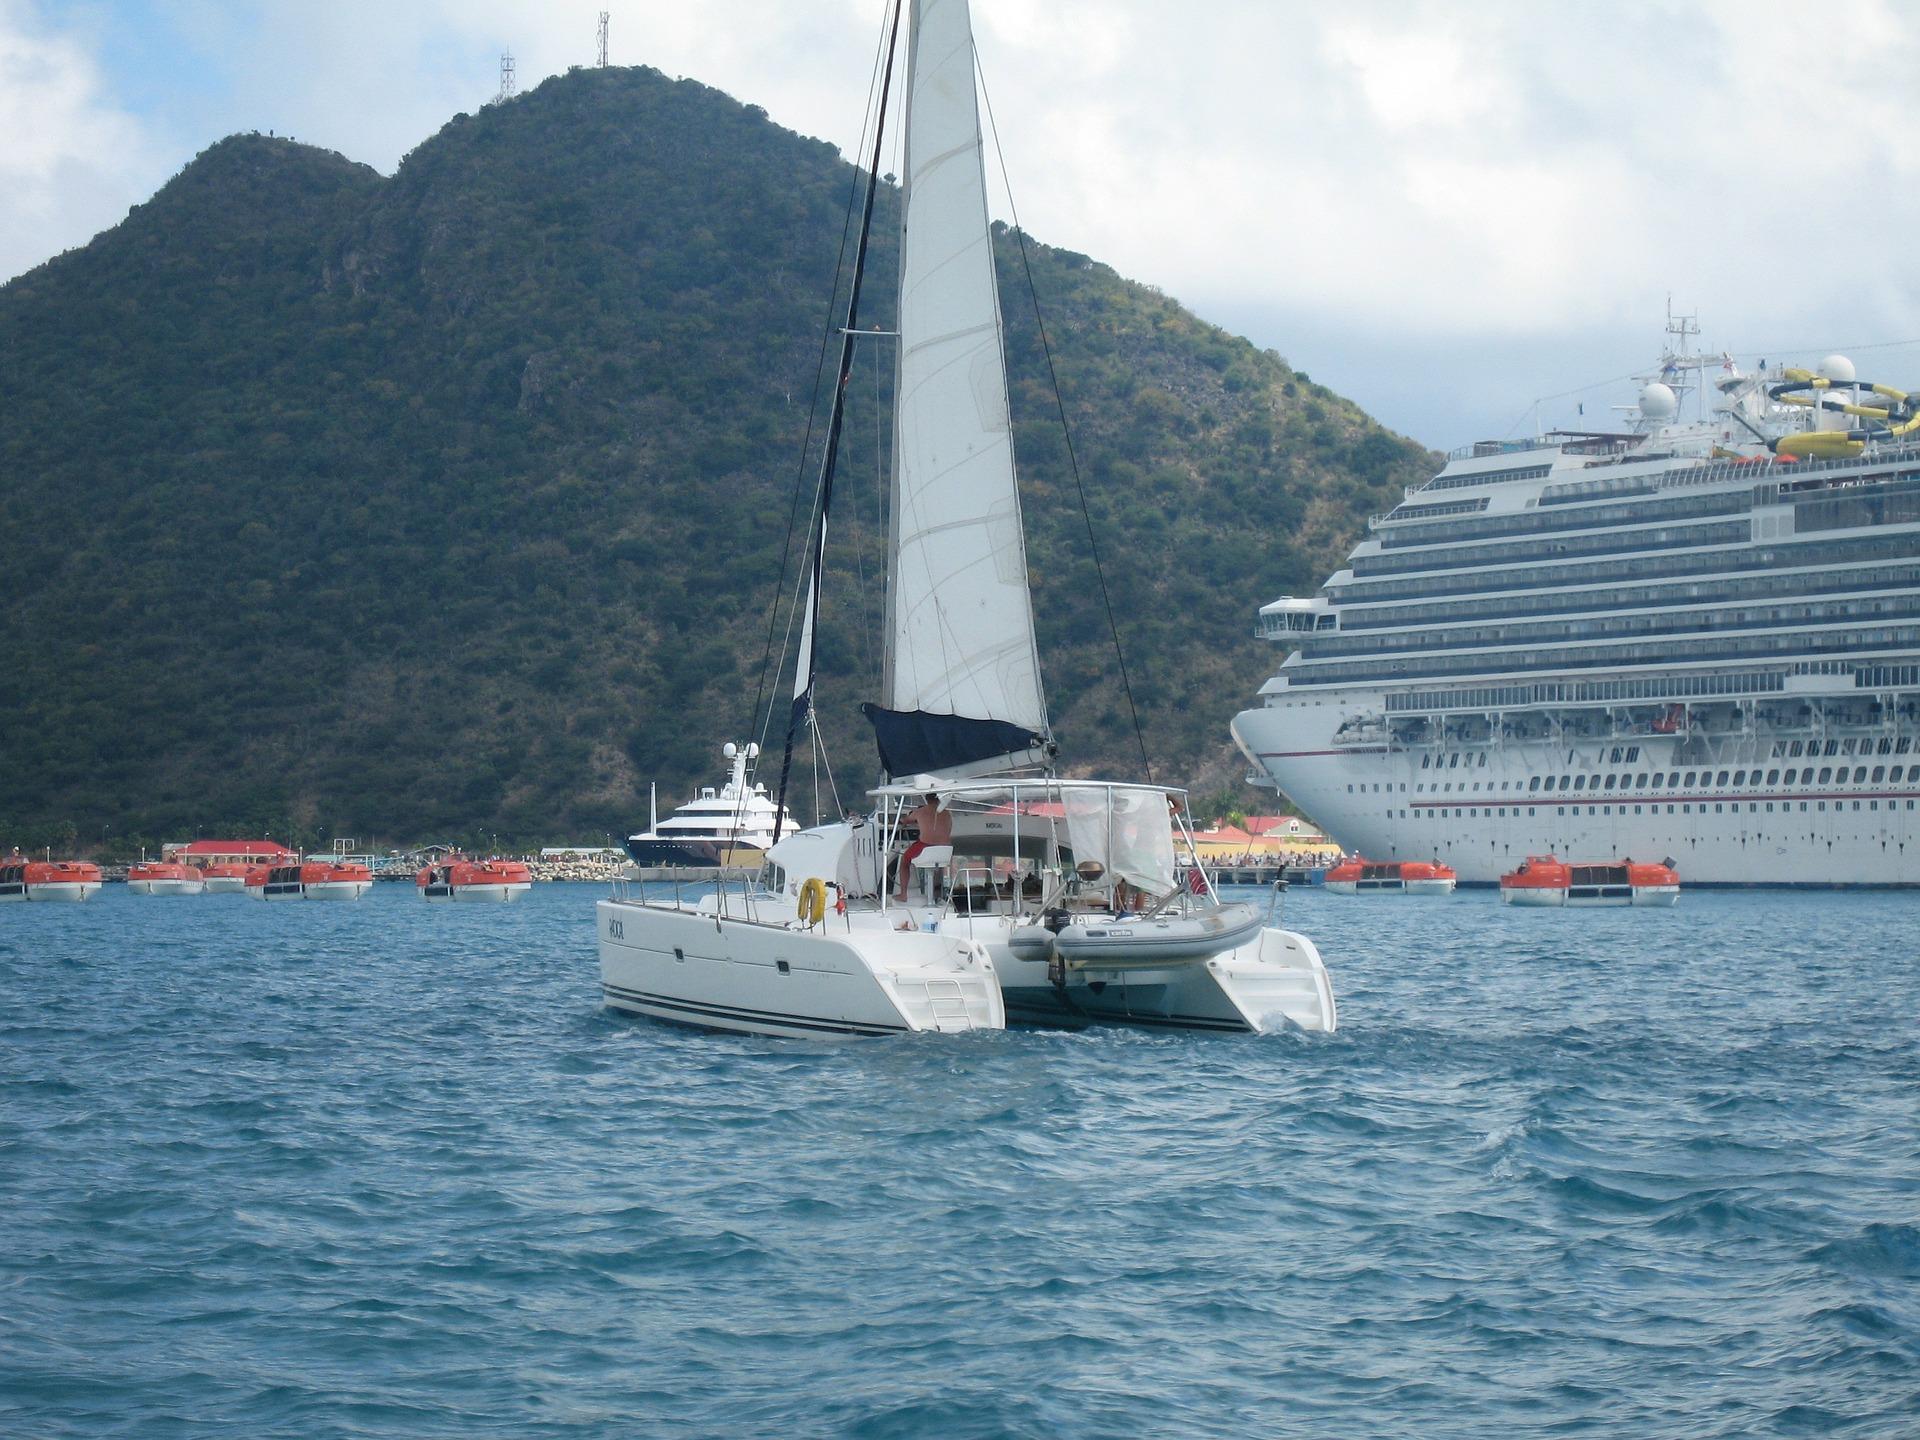 les catamarans